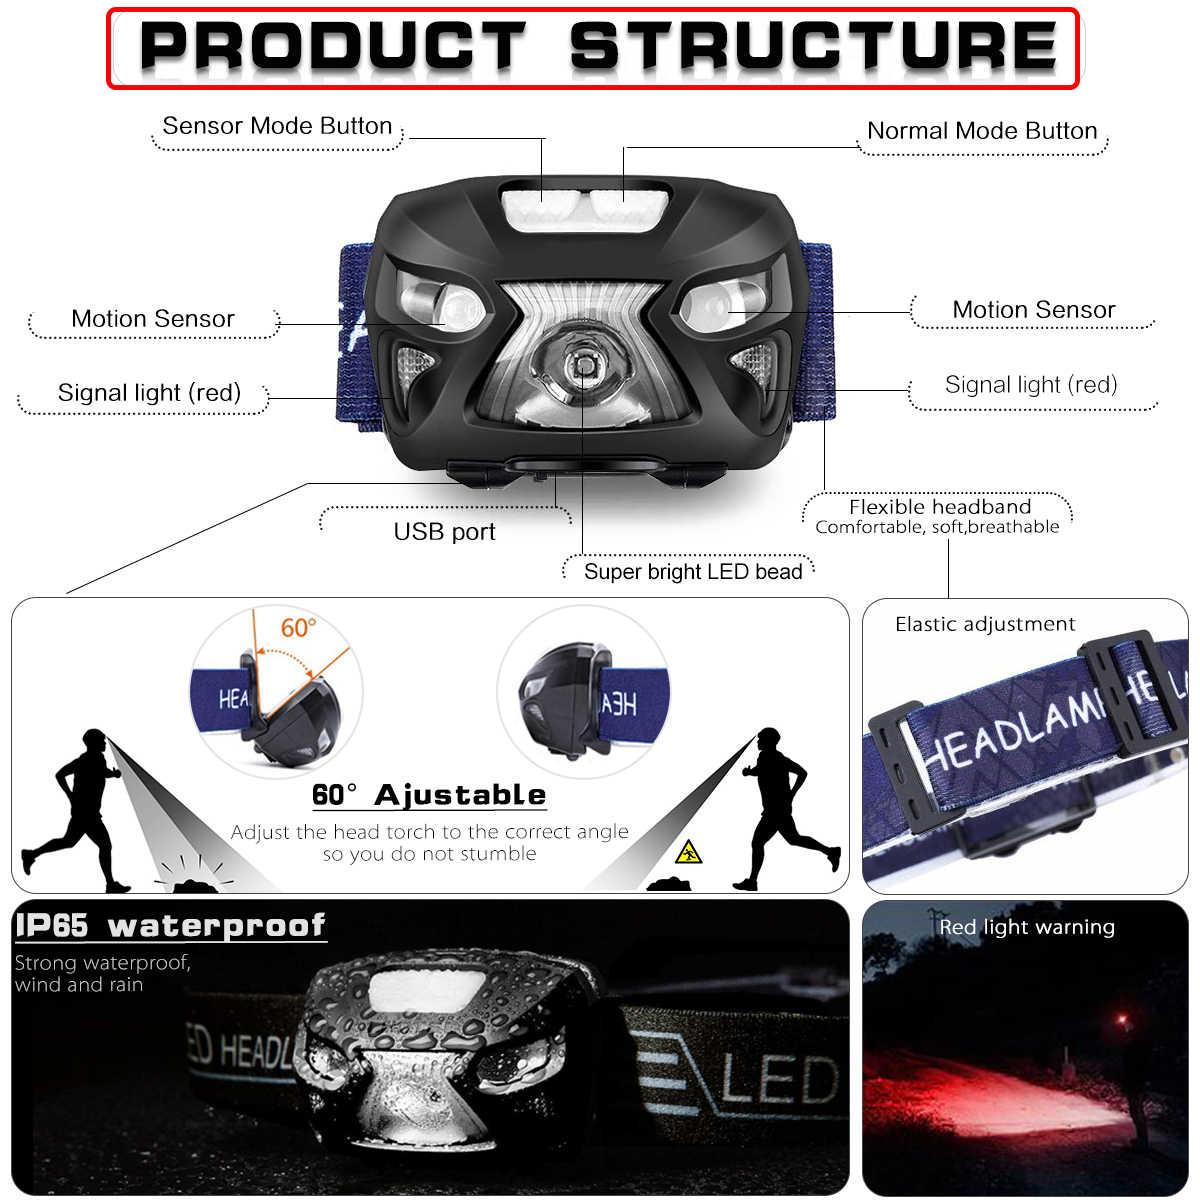 7000Lm 強力なヘッドランプ充電式 LED ヘッドライトボディモーションセンサーヘッド懐中電灯キャンプトーチライトランプ Usb